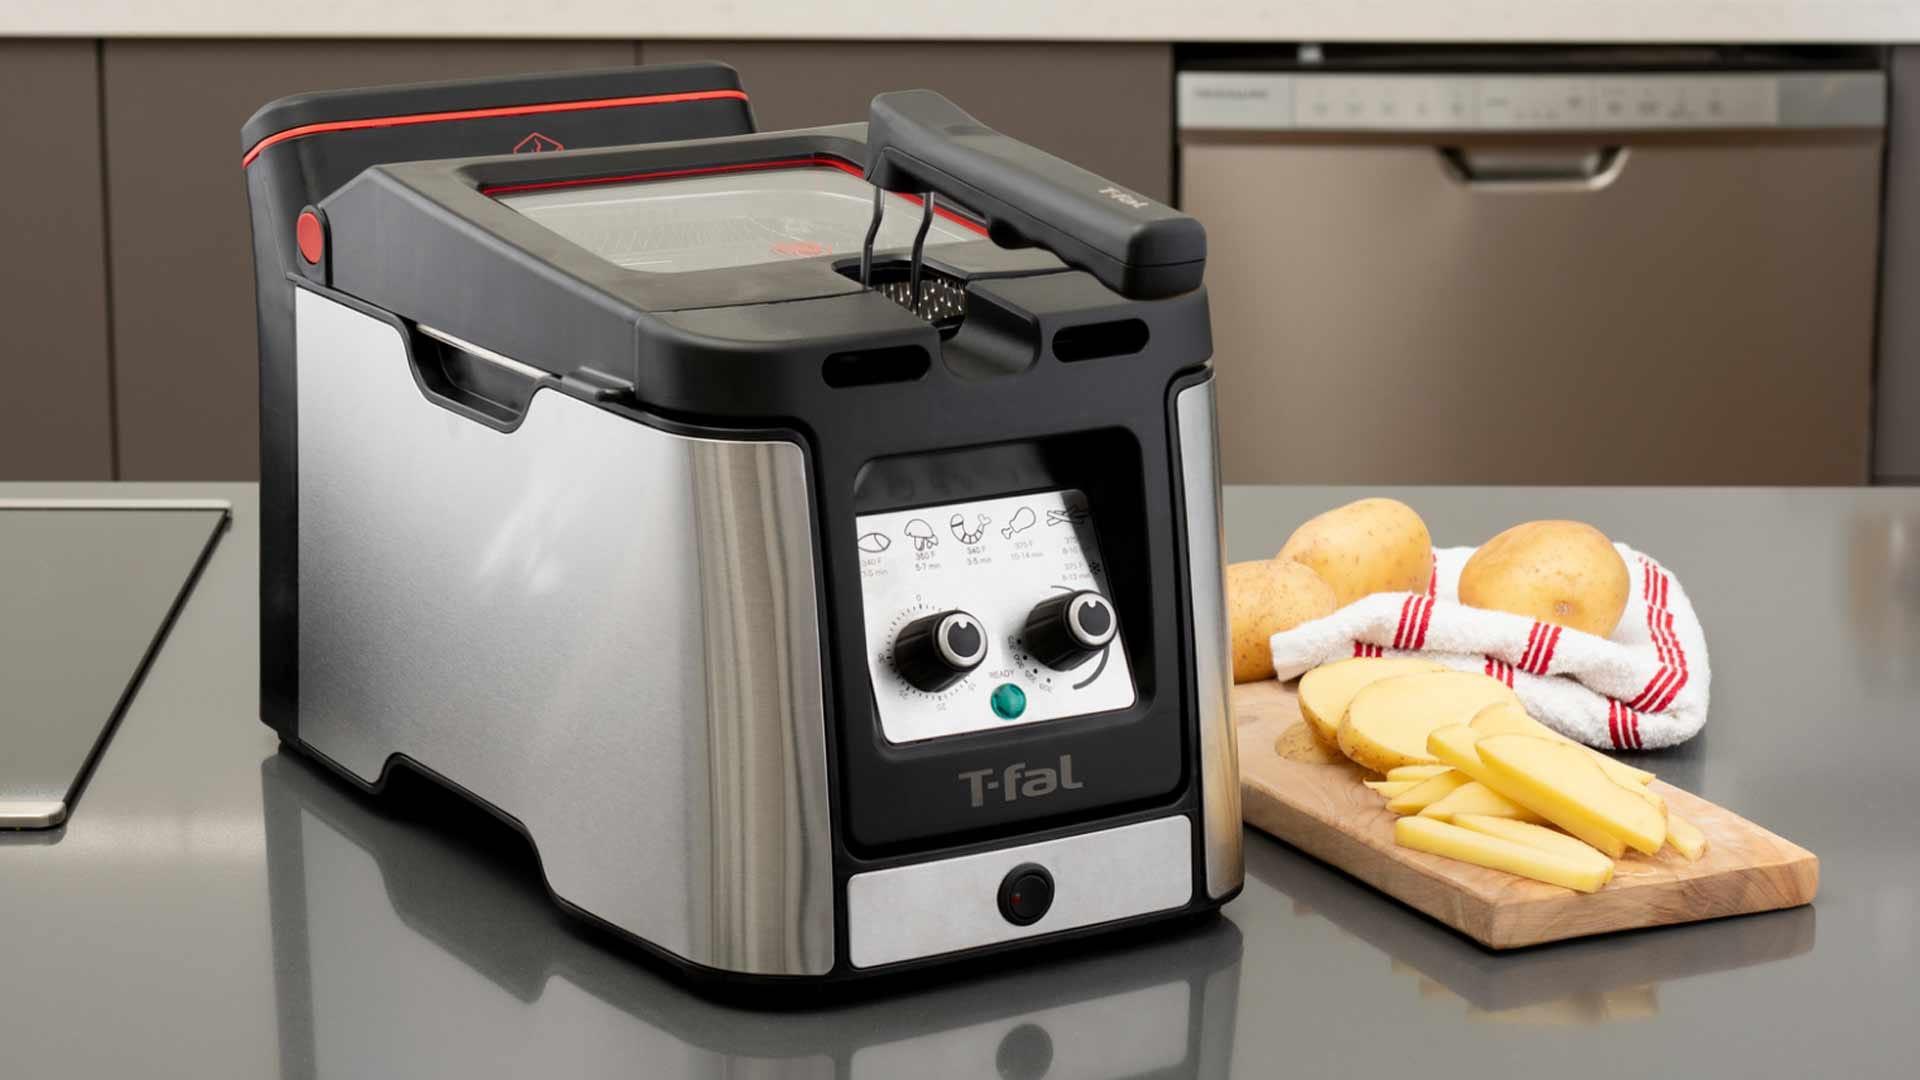 A T-Fal countertop deep fryer in a modern kitchen.